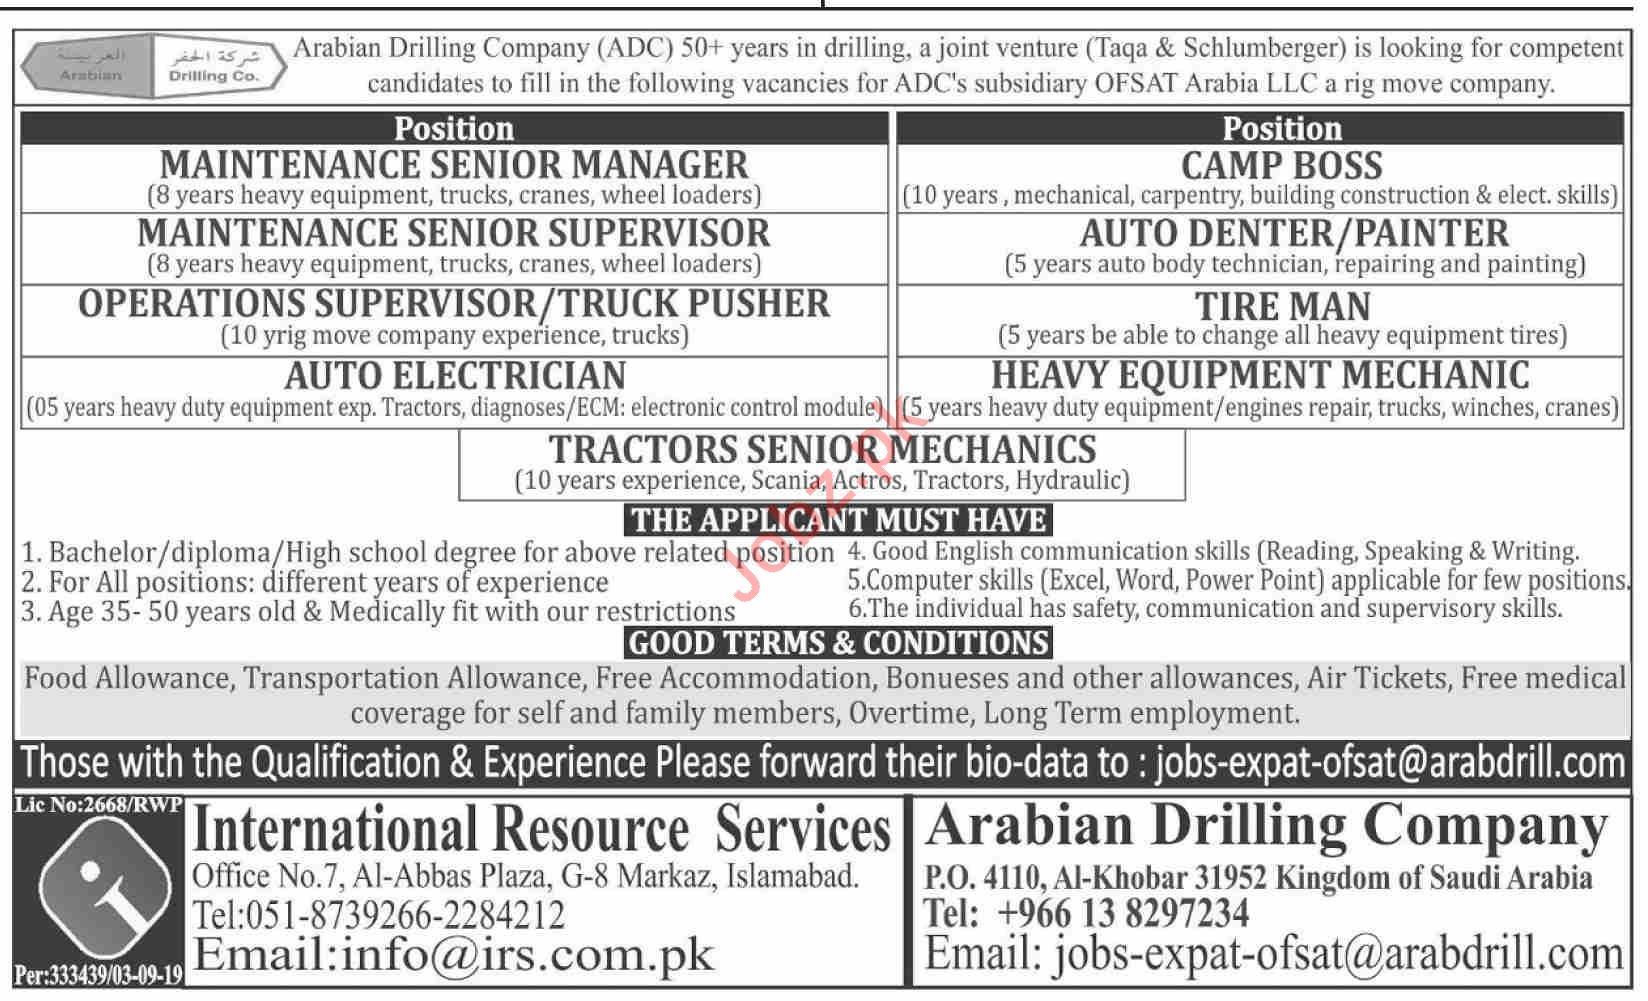 Arabian Drilling Company Al Khobar Saudi Arabia Jobs 2019